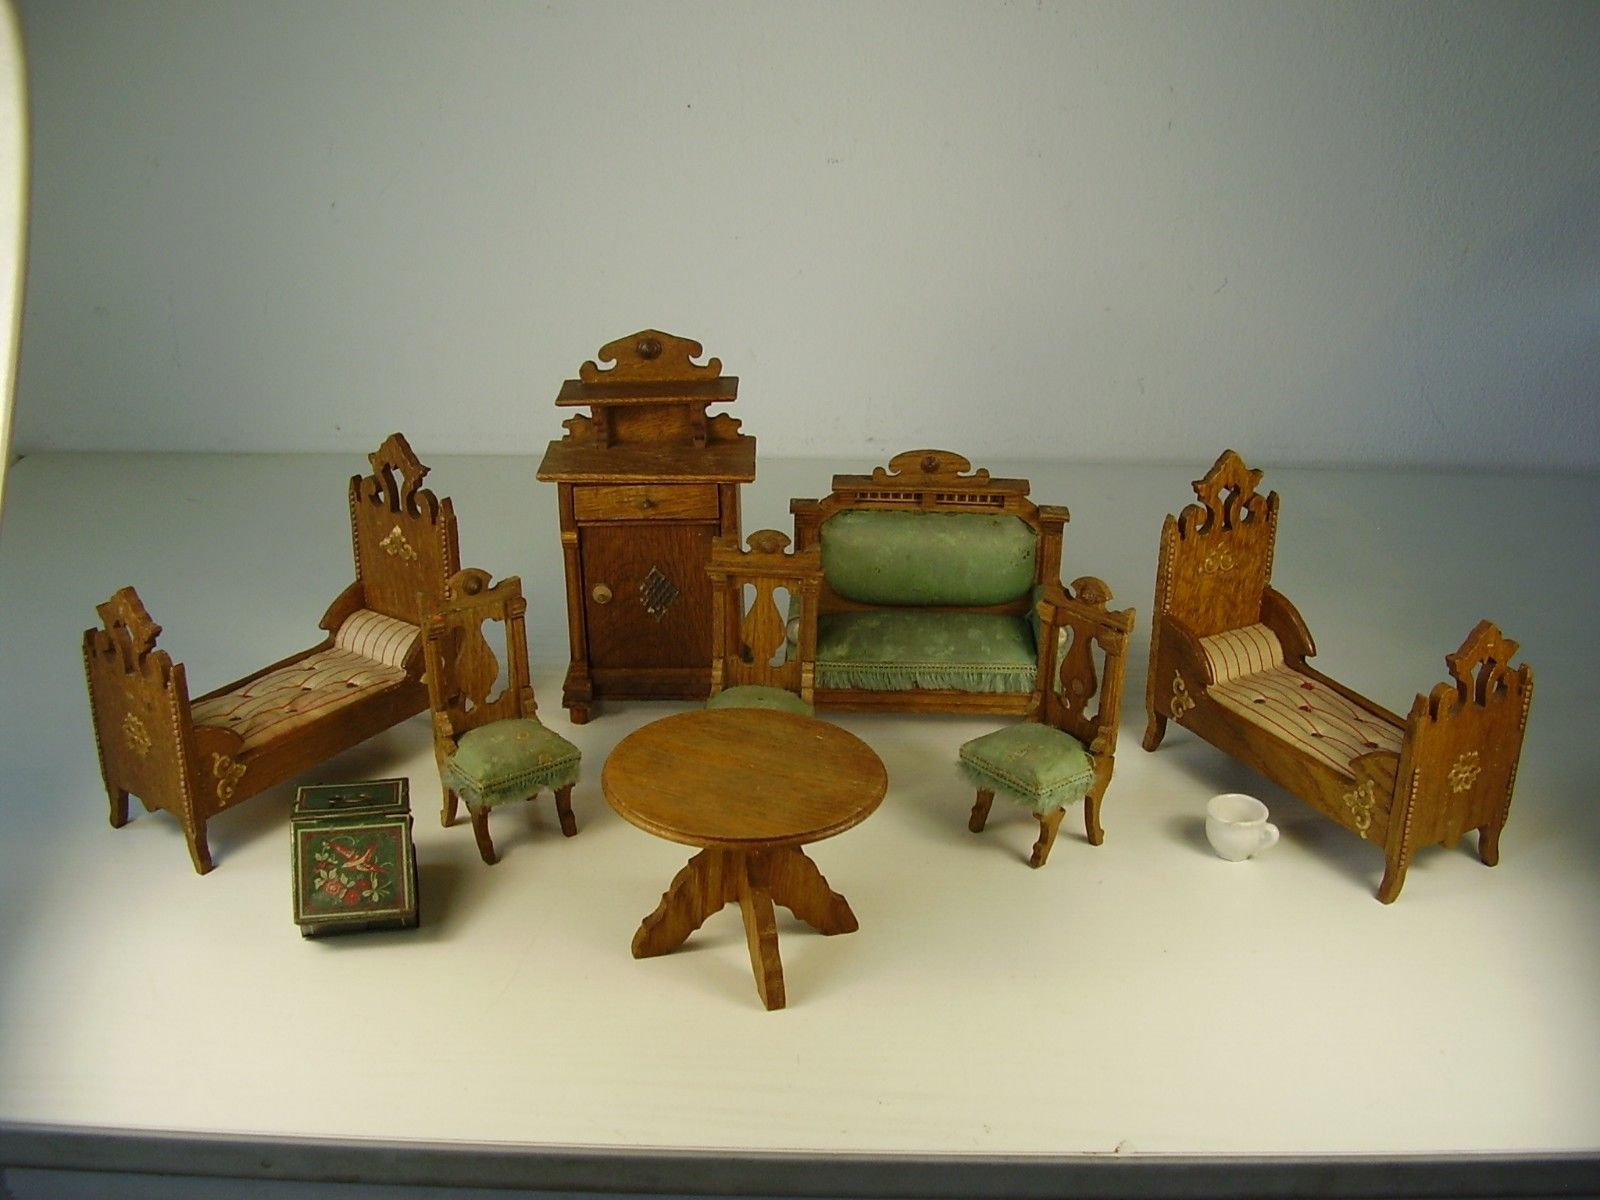 Antikes Puppenstuben Mobel Um 1880 Ebay Doll House Dollhouse Furniture Antique Dolls